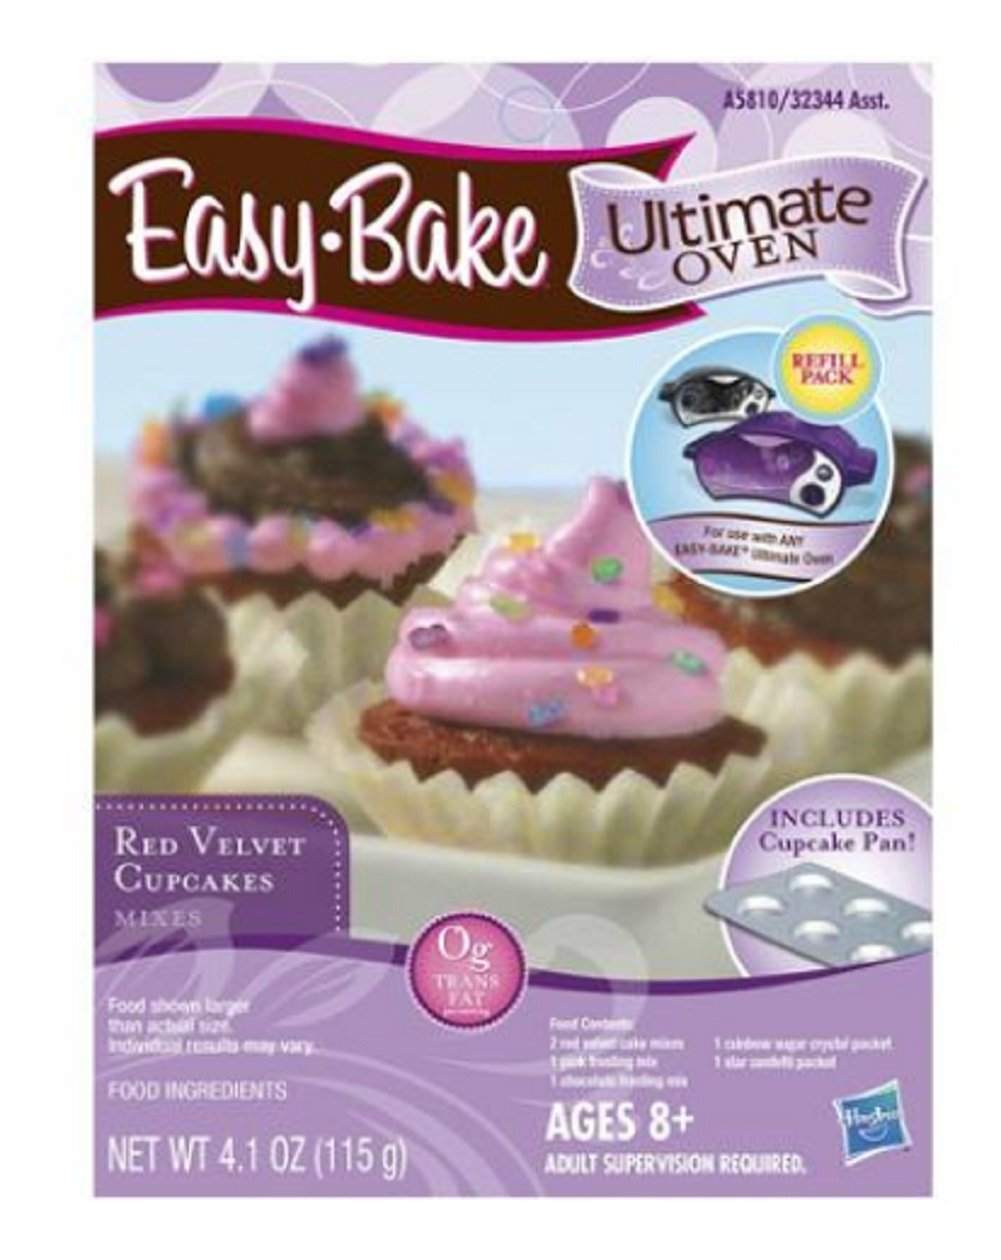 Easy Bake Ultimate Hasbro Oven Cupcake Mix Pan Amp Wrap